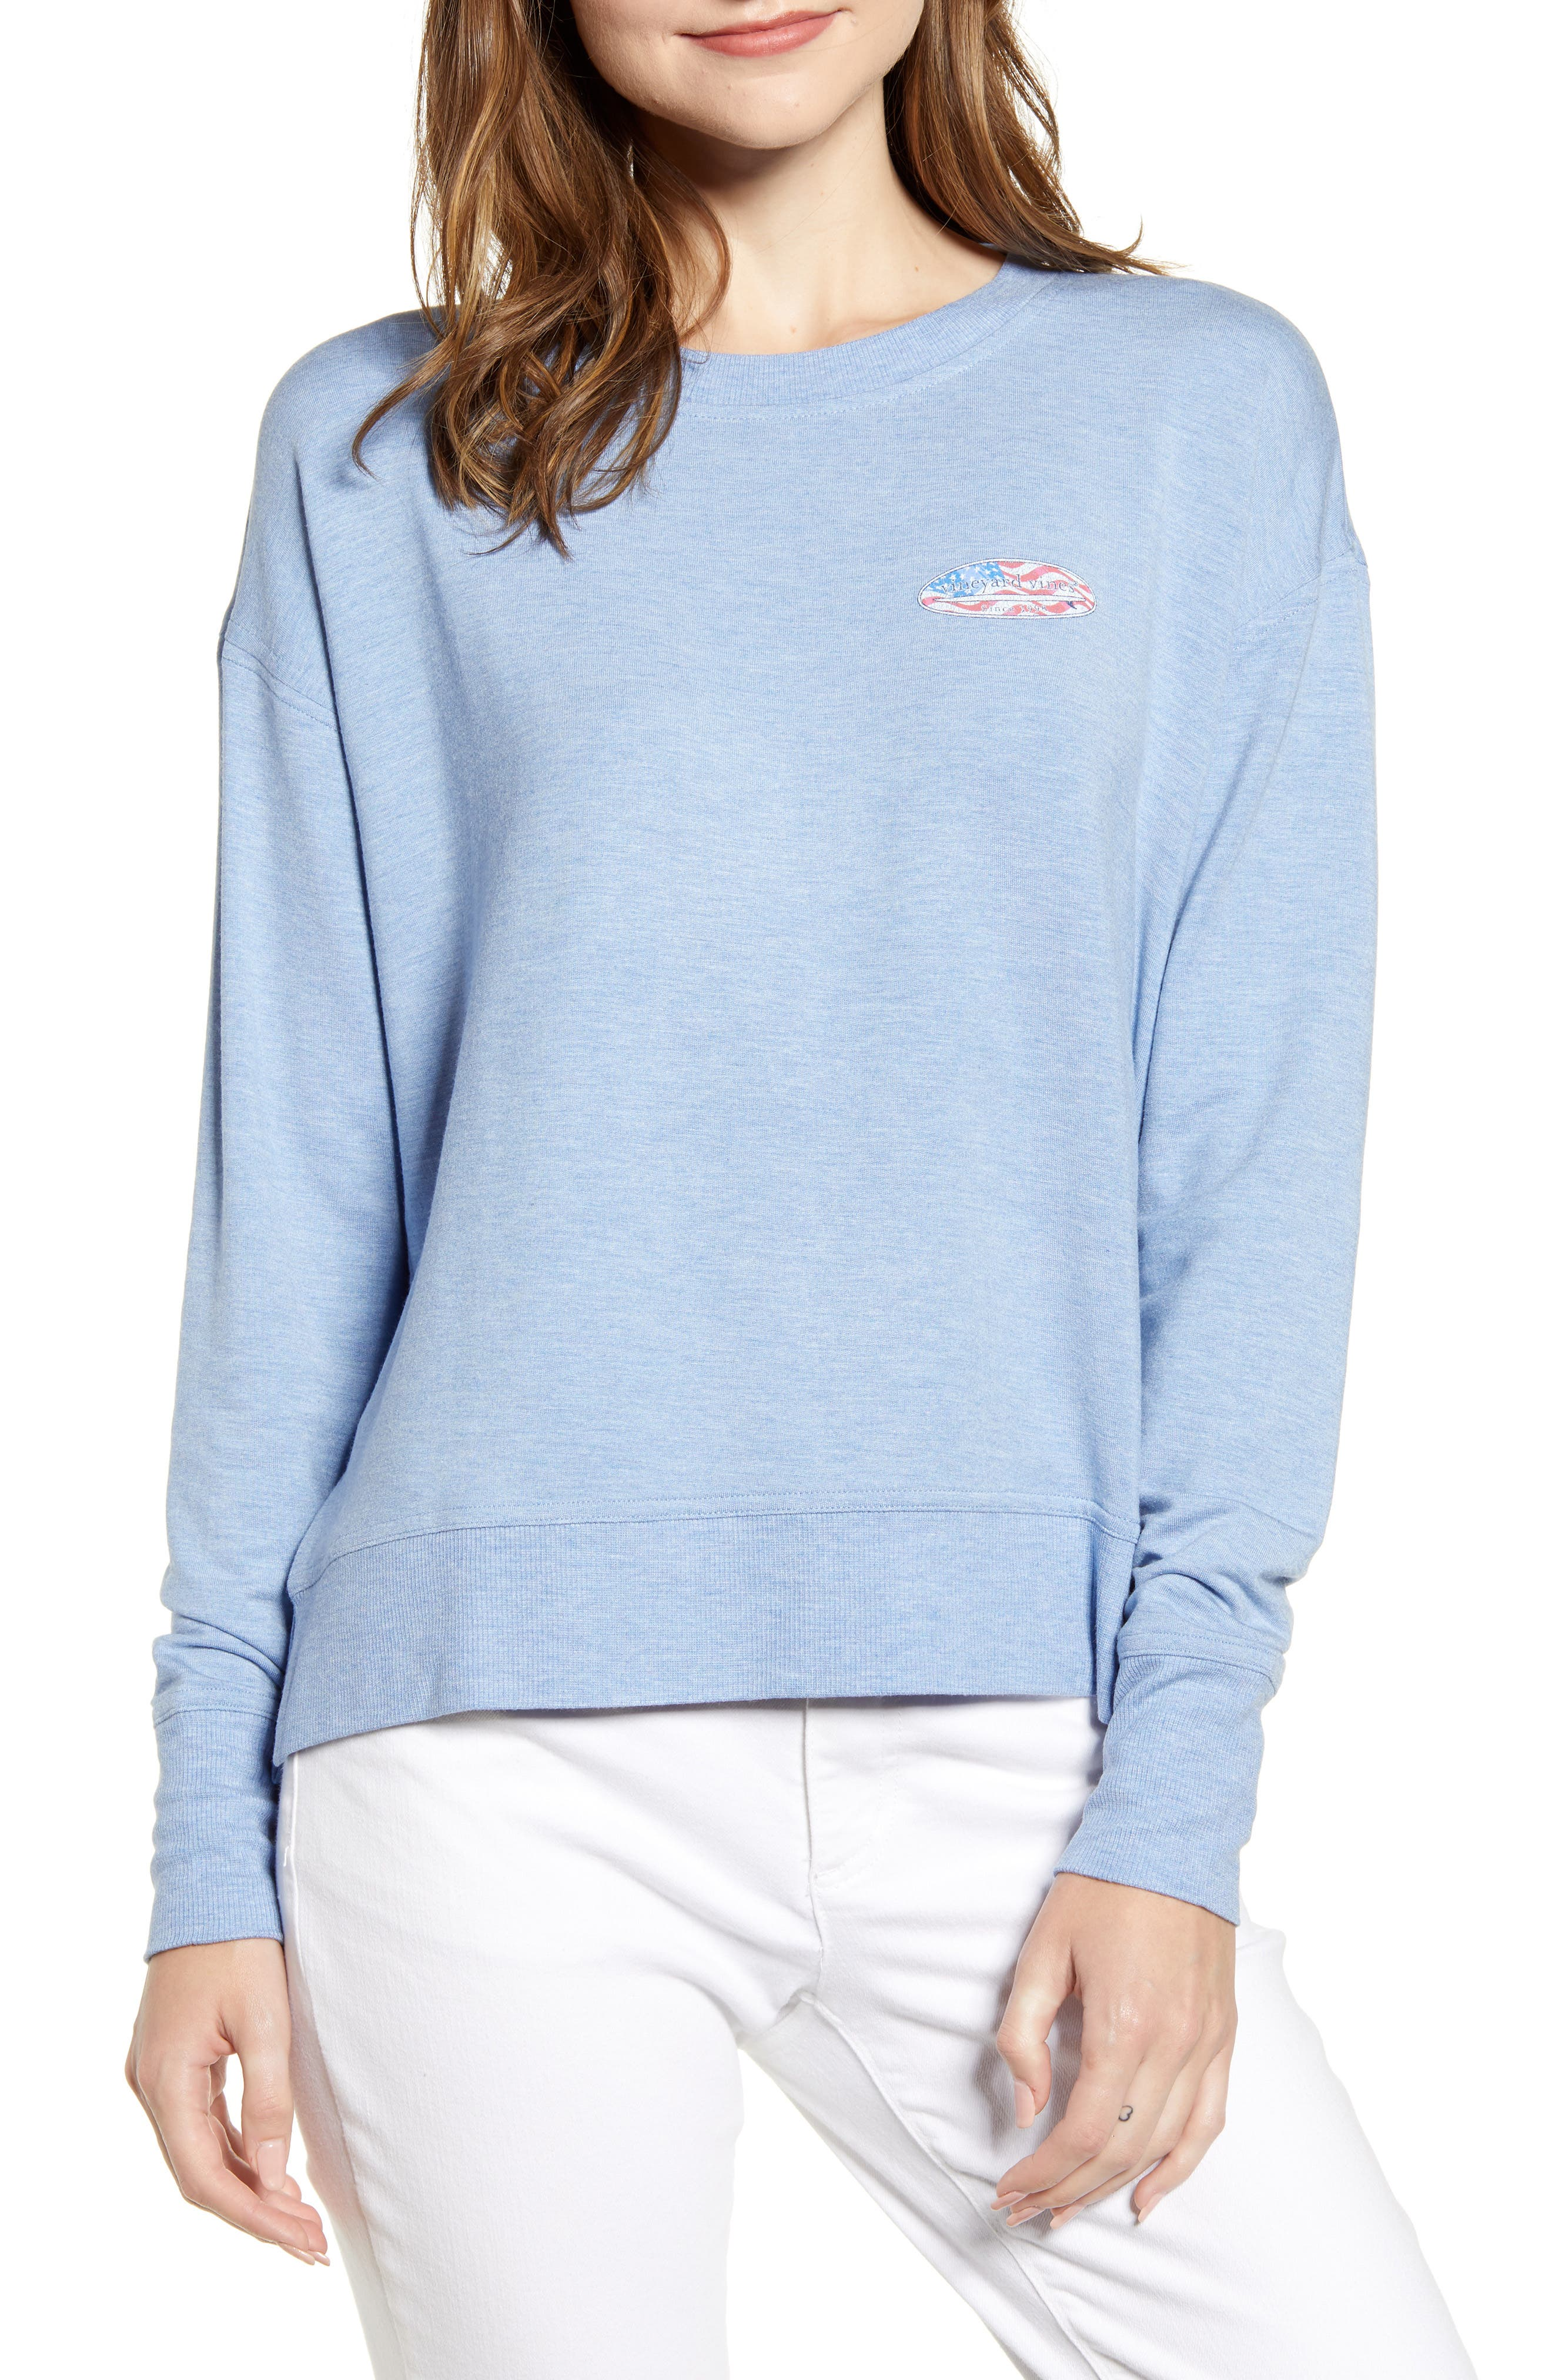 Vineyard Vines Surf Flag Crewneck Sweatshirt, Blue